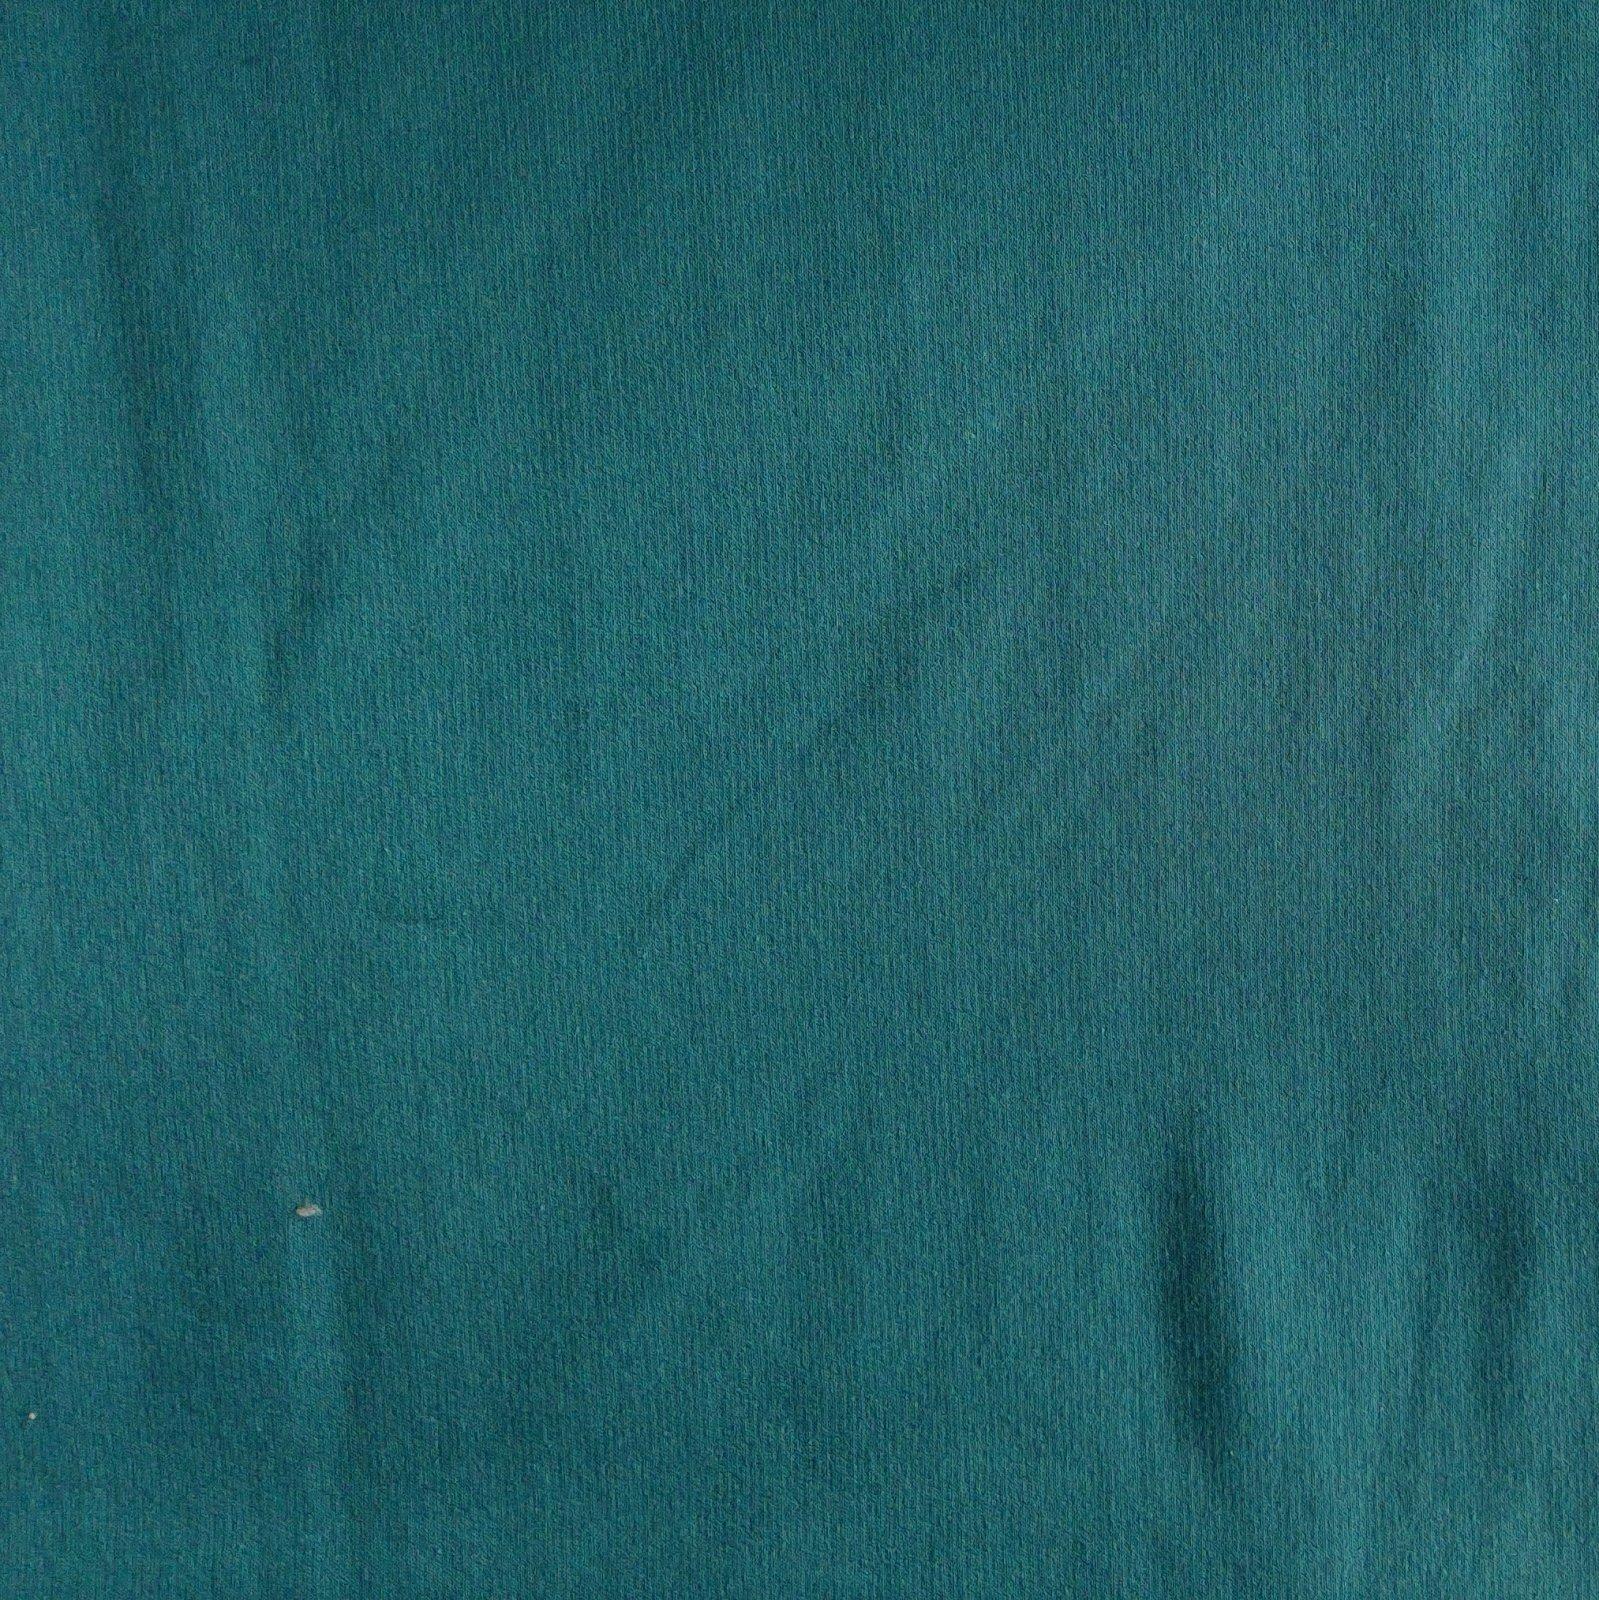 T-Shirt Interlock Cotton Blend, Bare Knits, Spruce